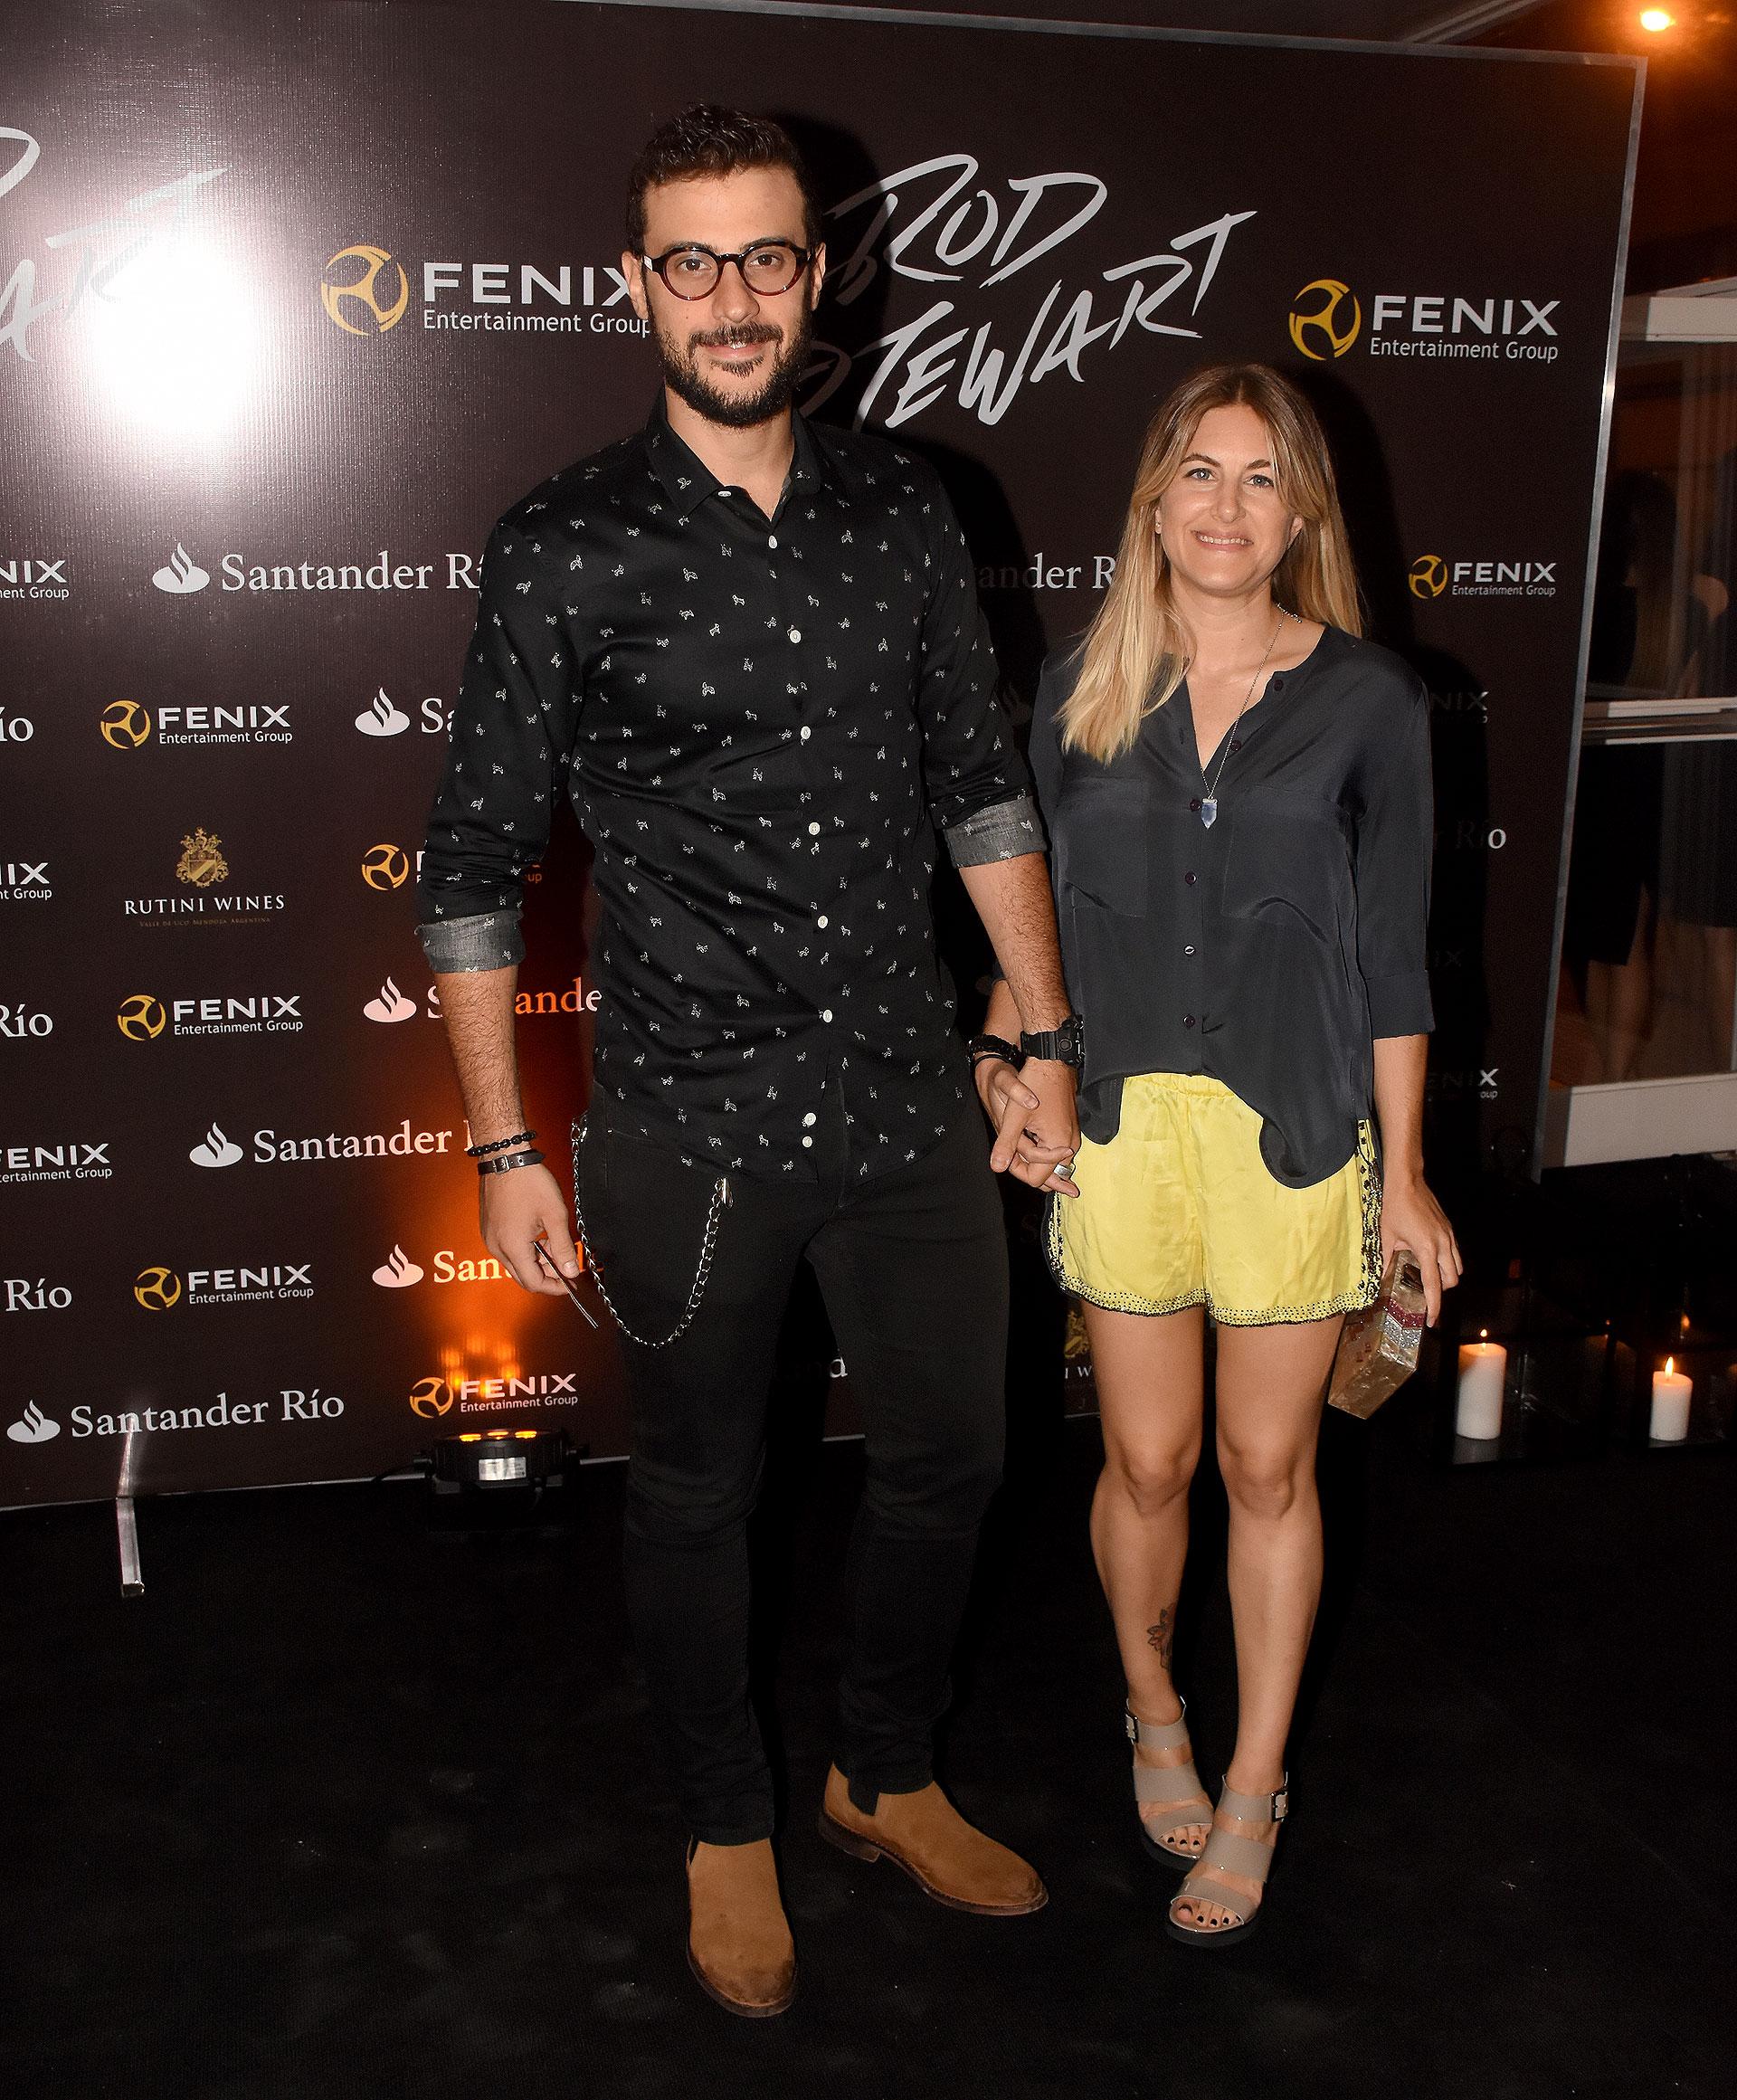 Dieron Leuco y Daniela Haissiner